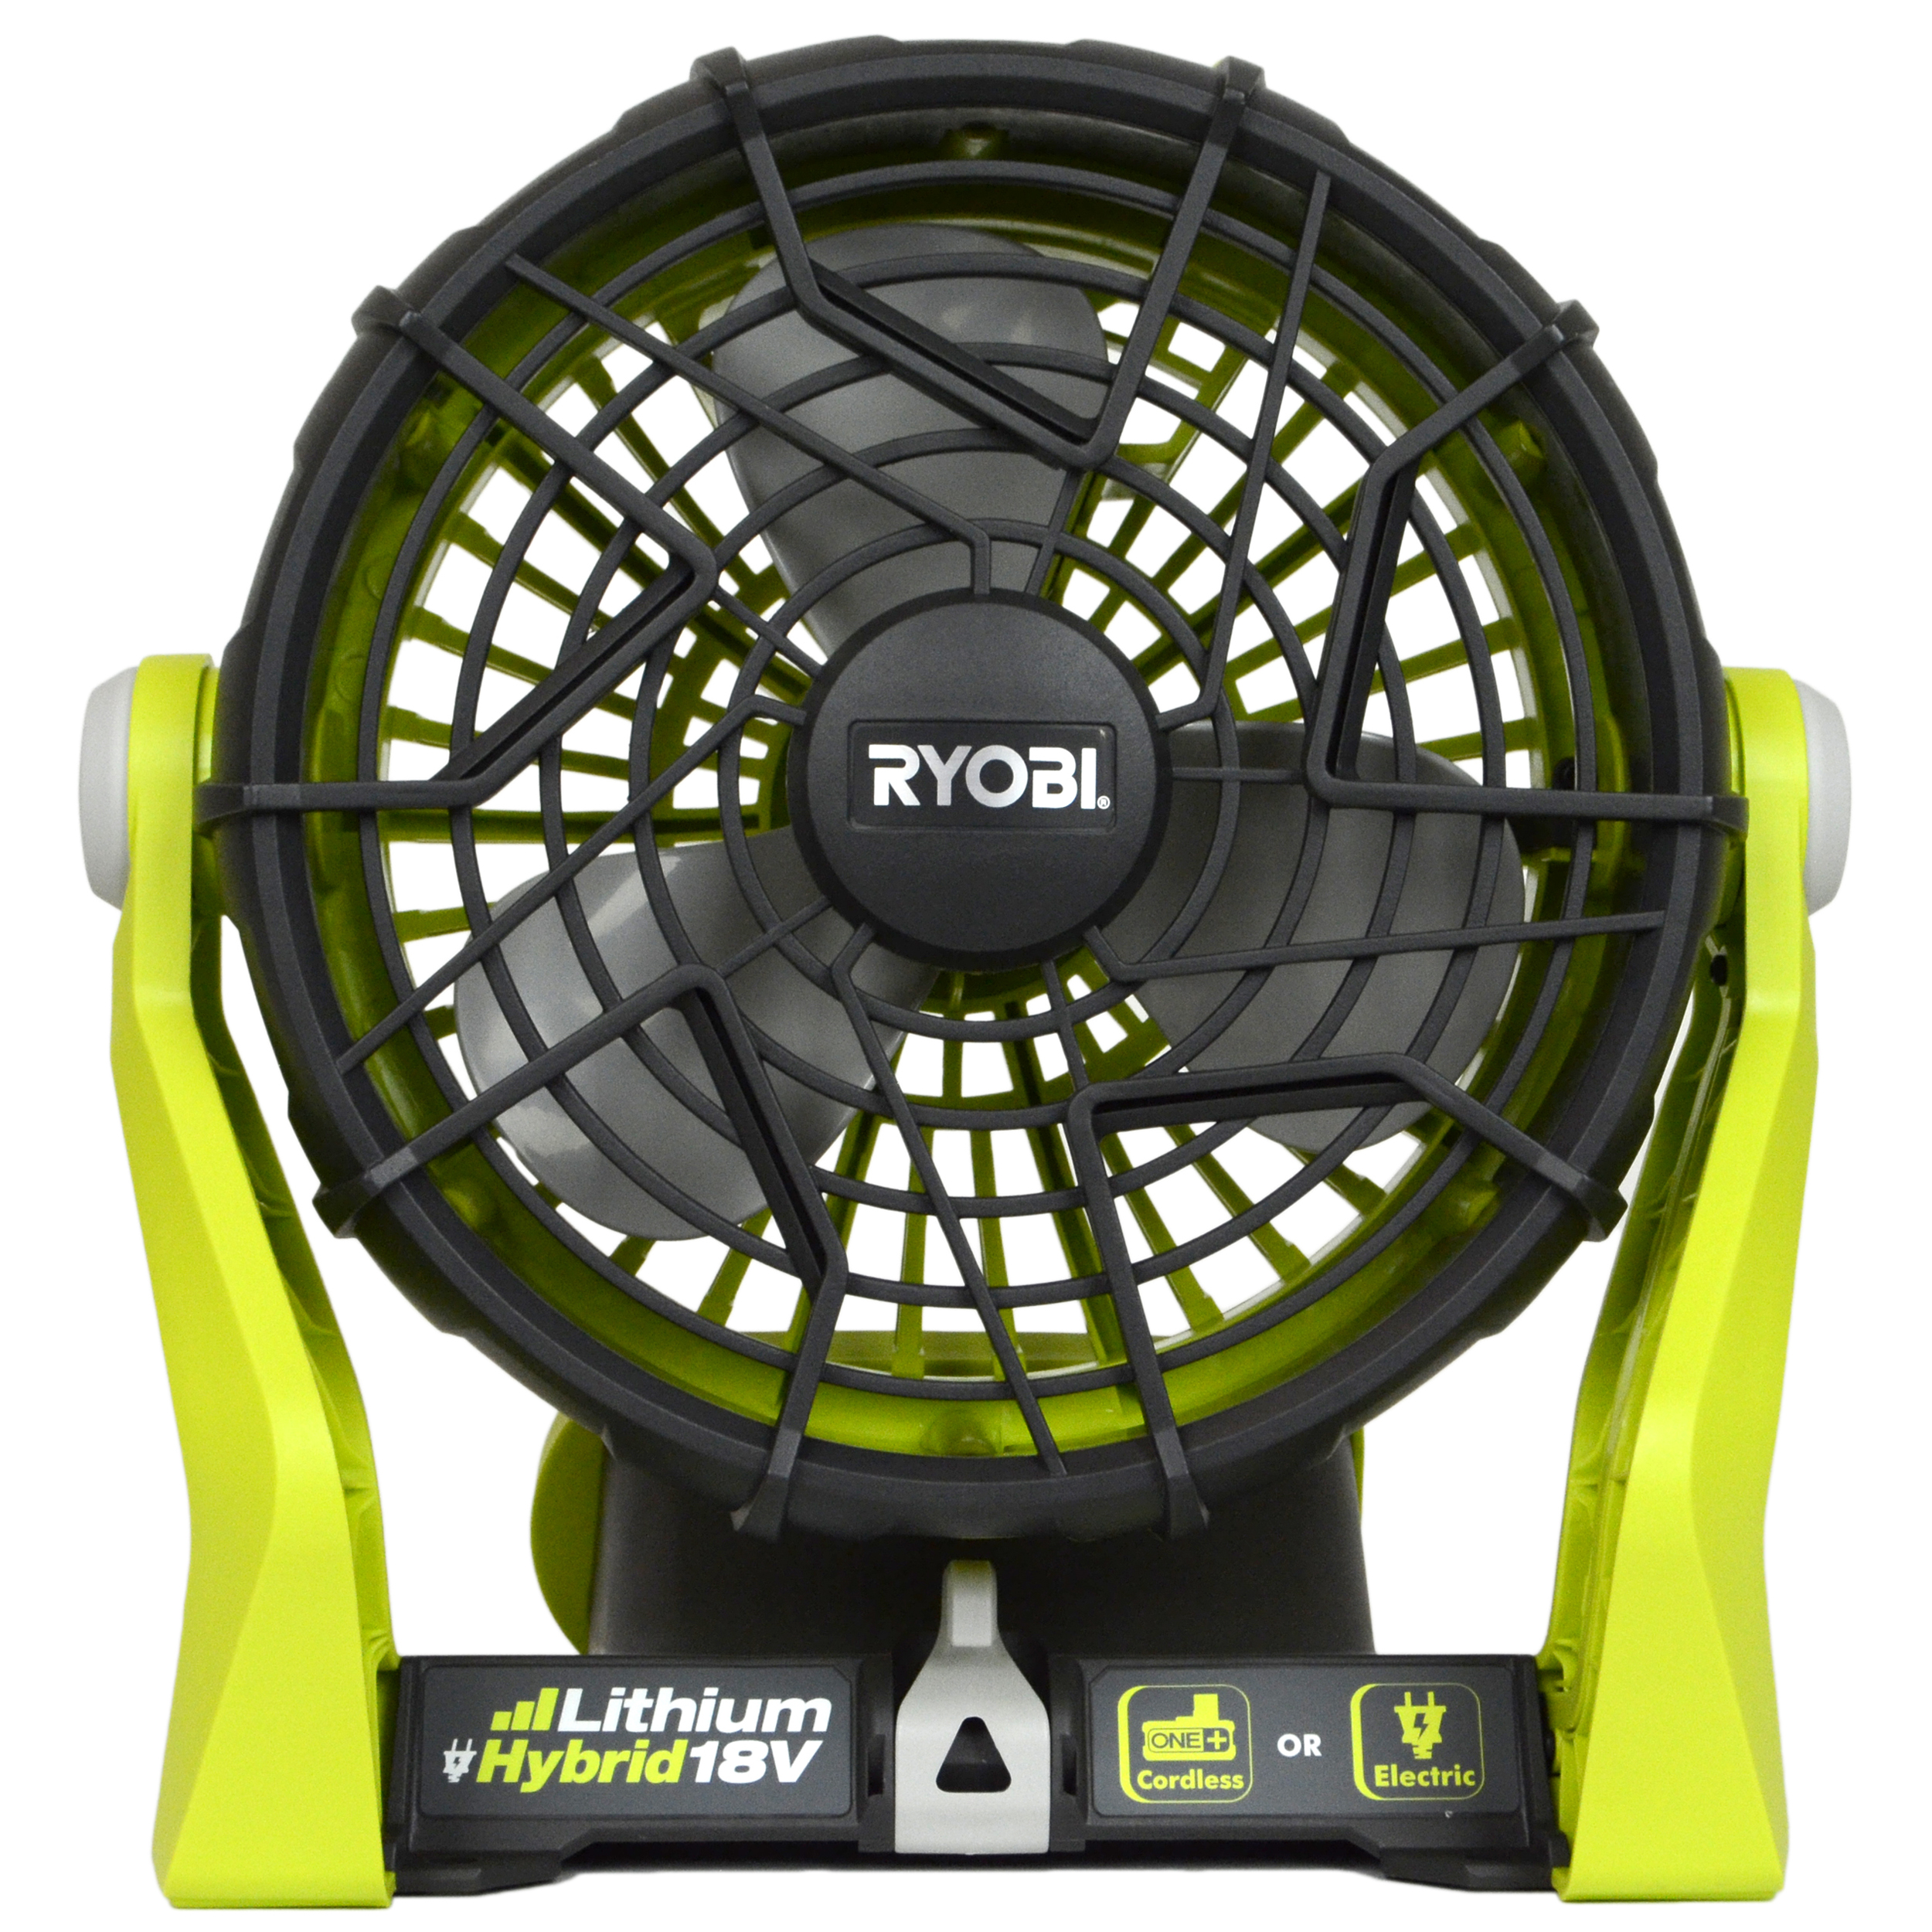 Ryobi P3320 120V AC or 18V ONE+ Dual Power Portable Hybrid Electric Fan, Tool Only by